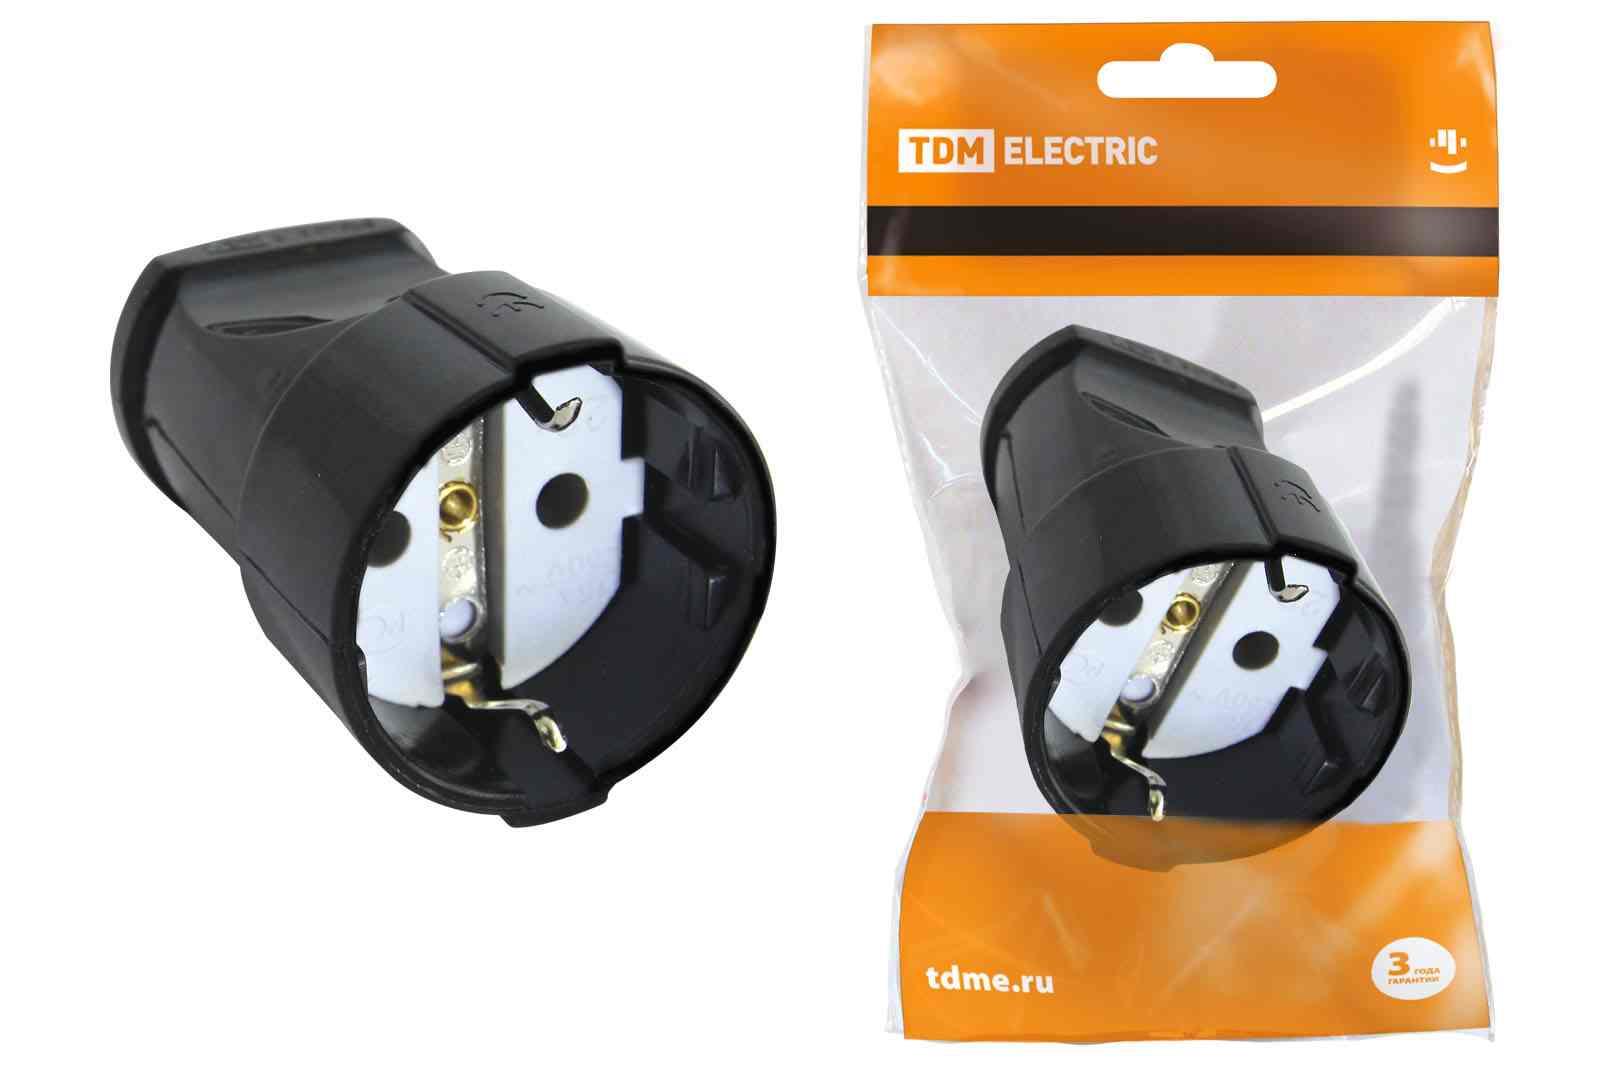 Розетка кабельная Tdm Sq1806-0129